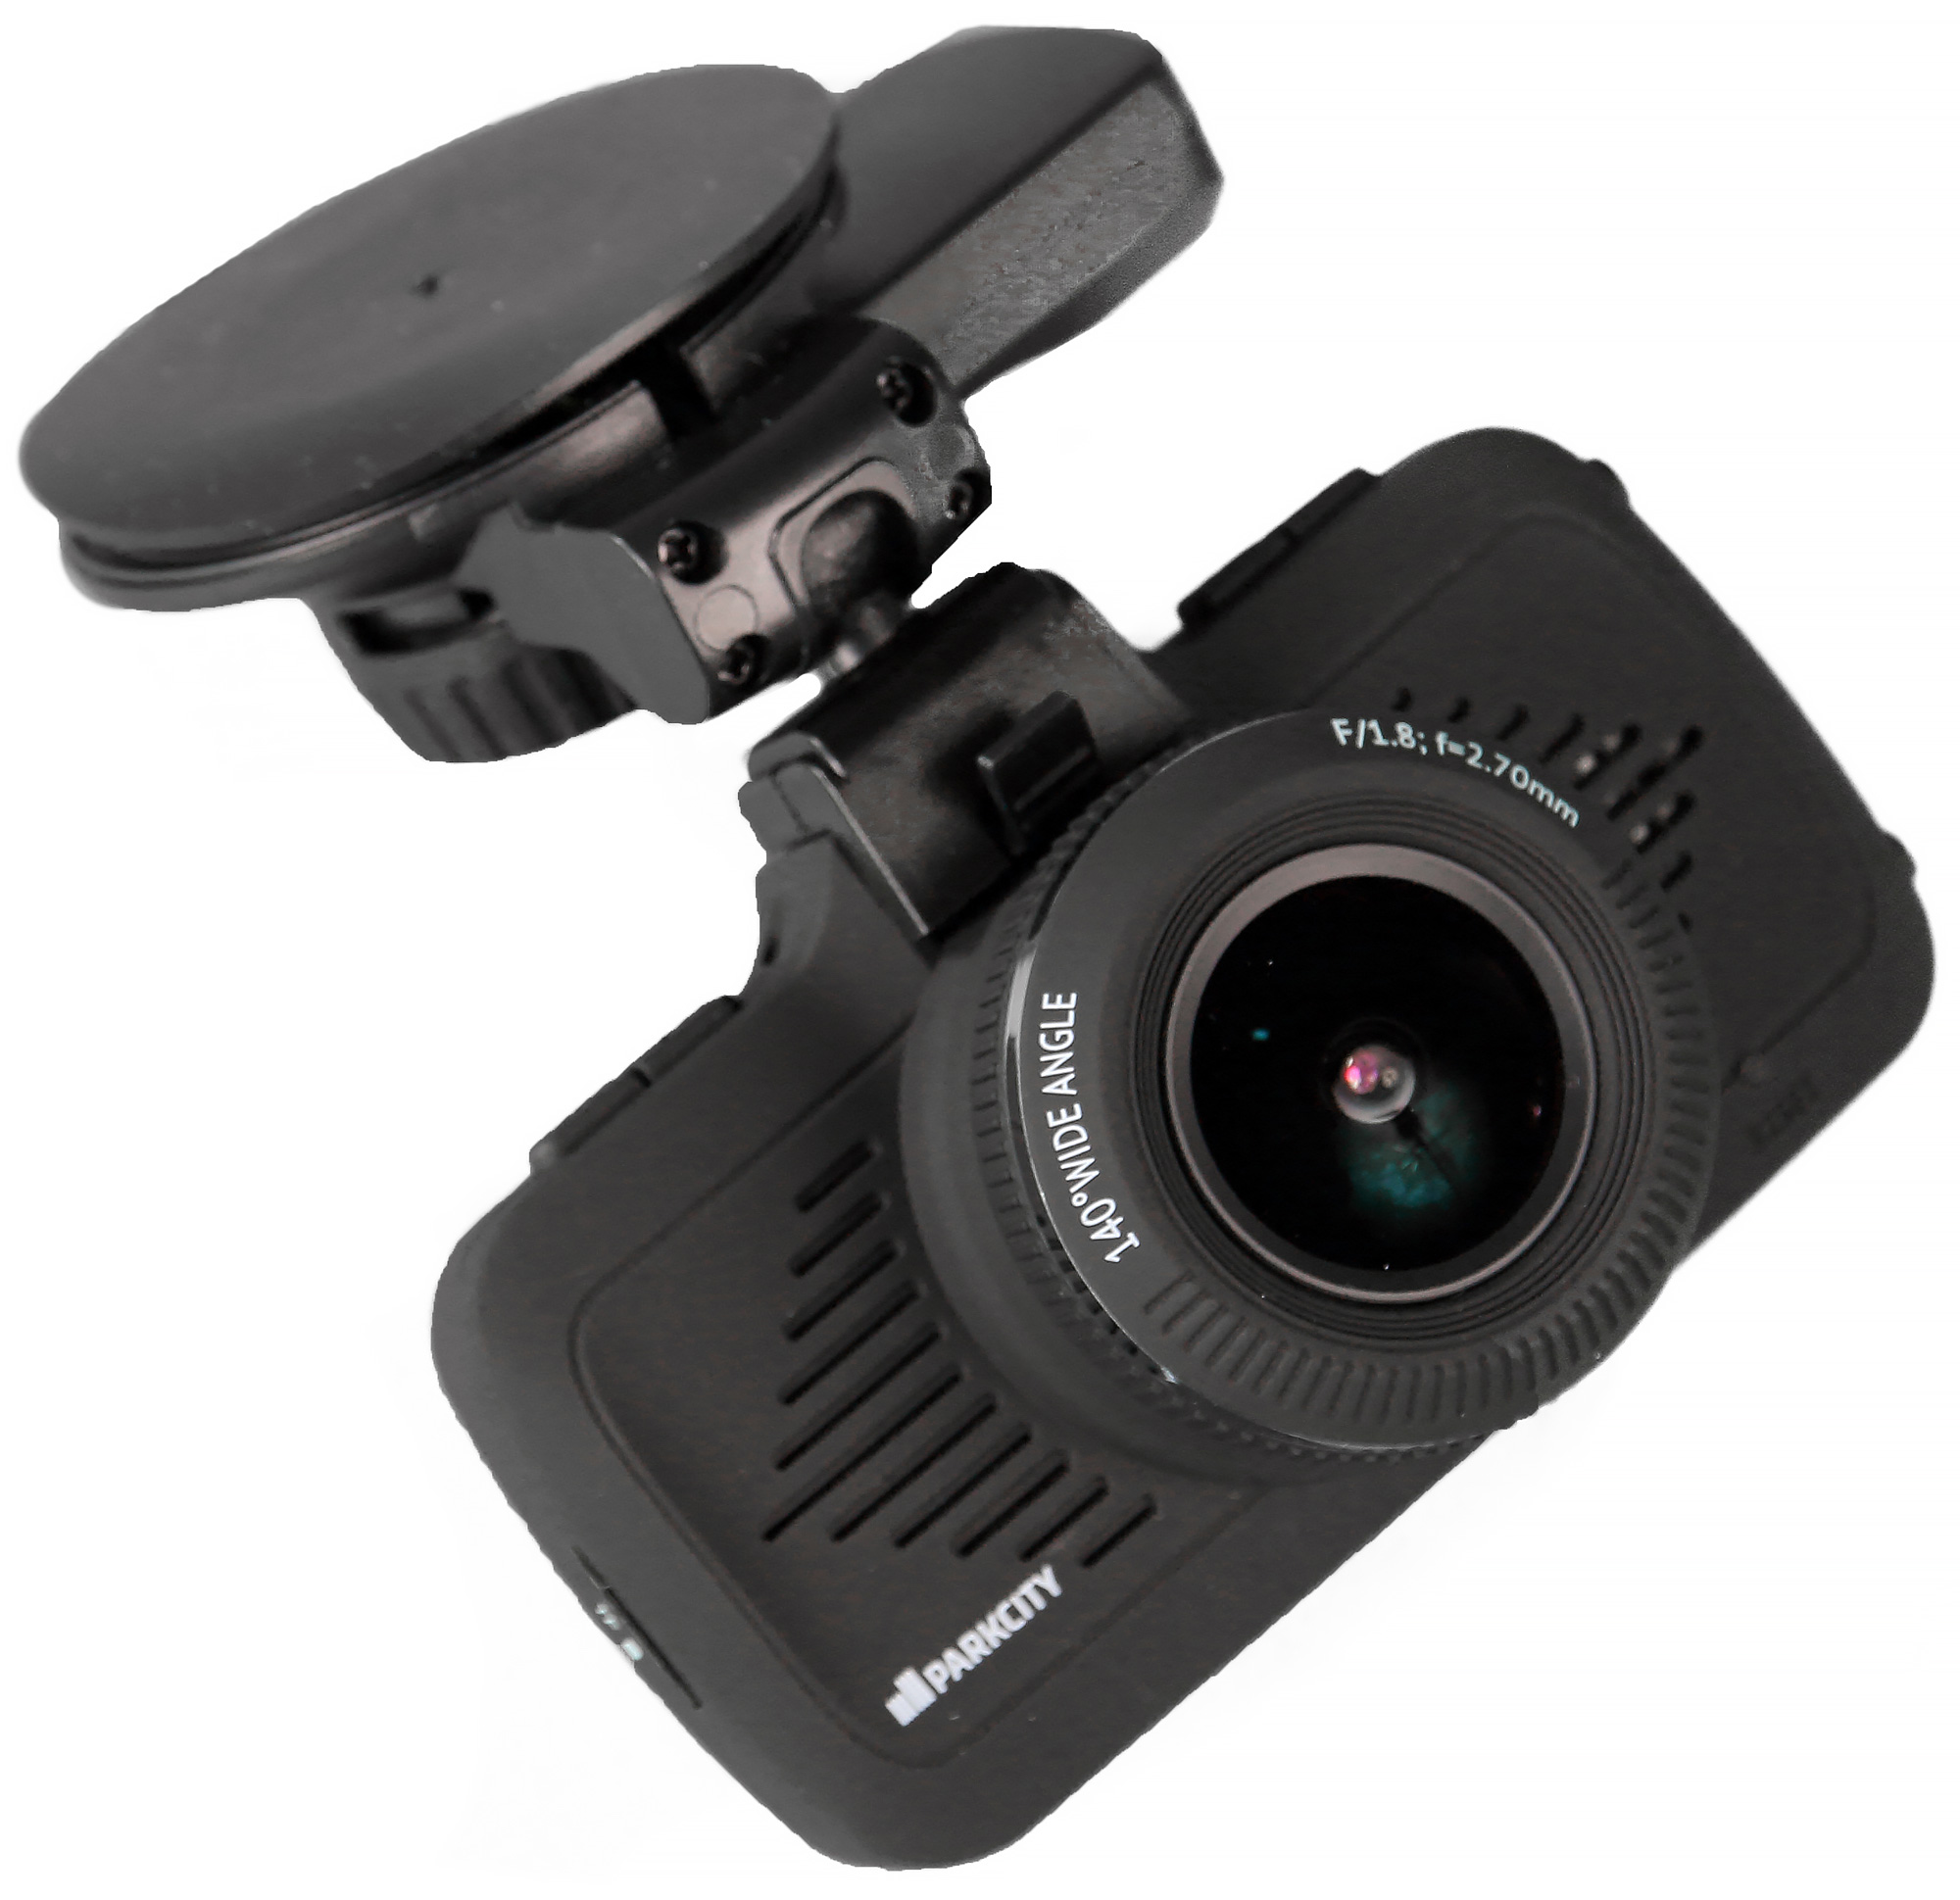 Защита объектива черная combo по сниженной цене купить dji goggles по акции в камышин